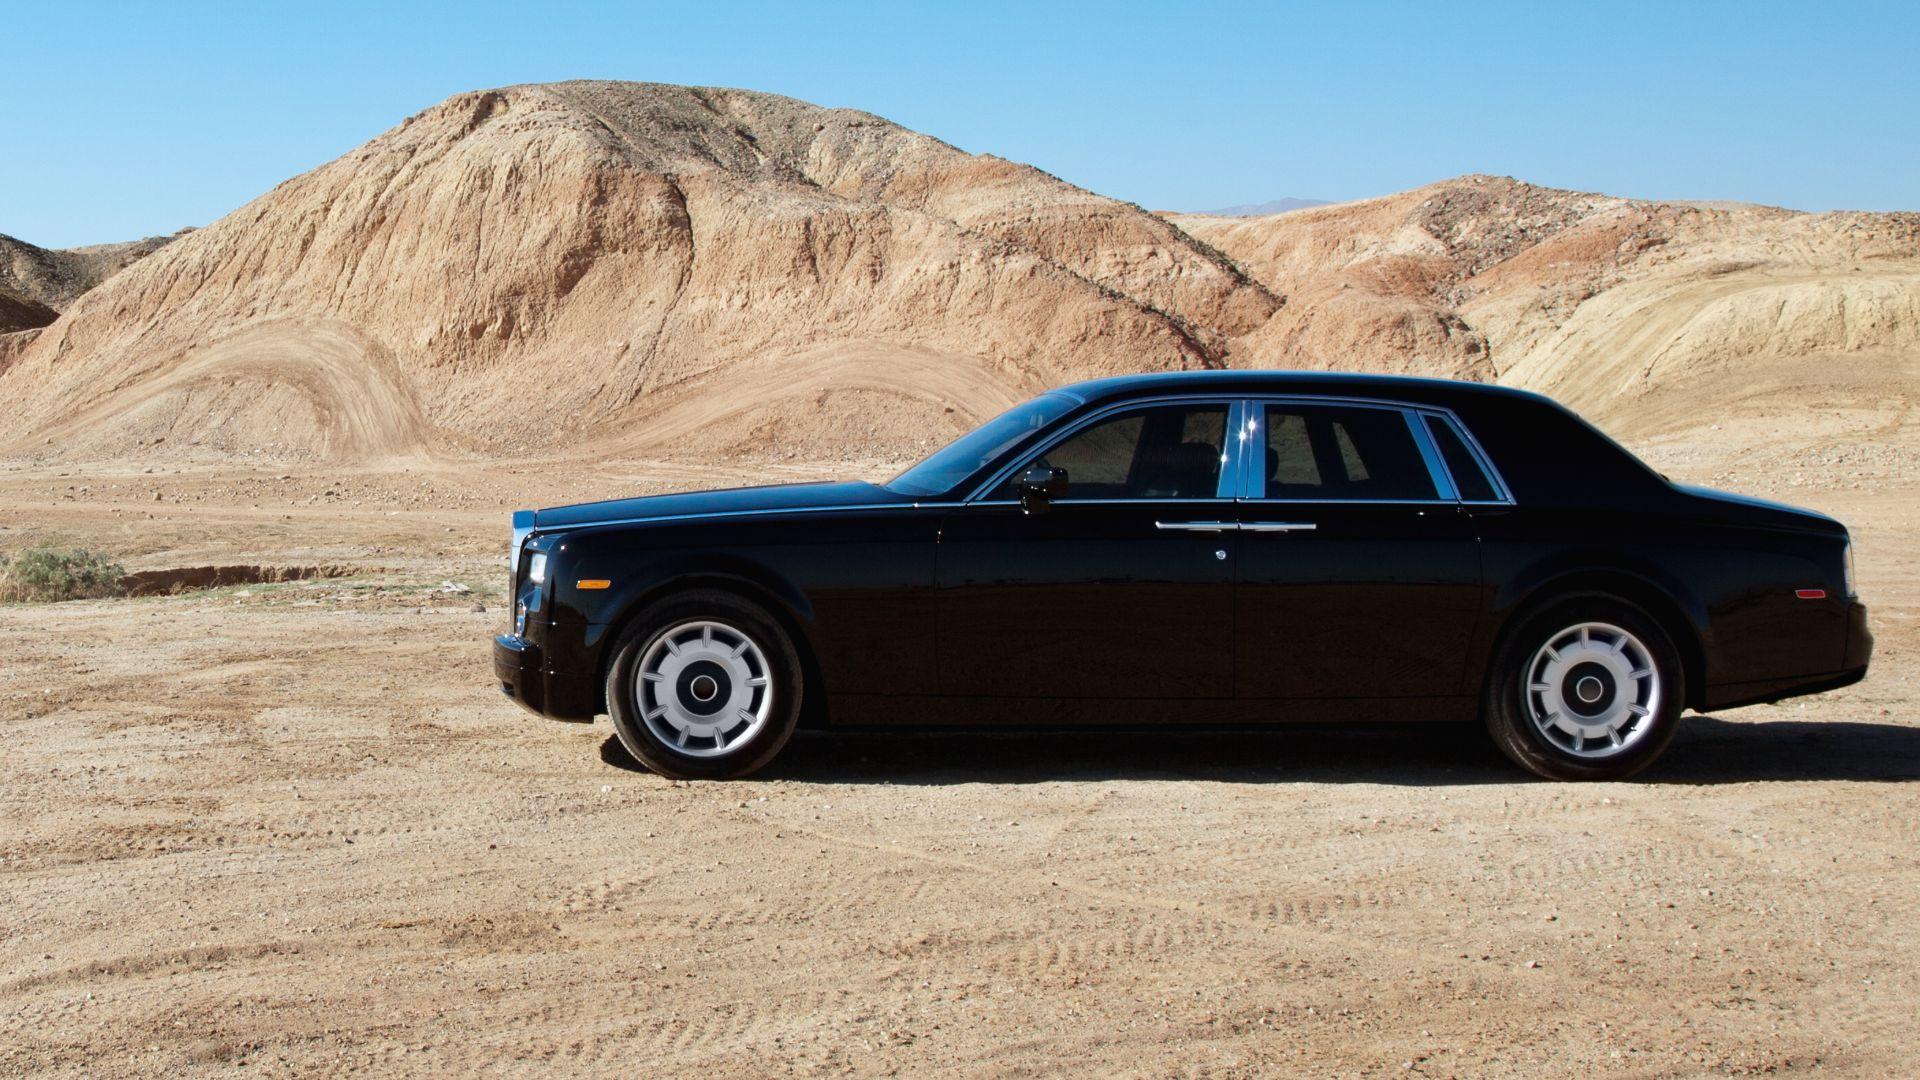 Rolls Royce Phantom Car Insurance - Keith Michaels